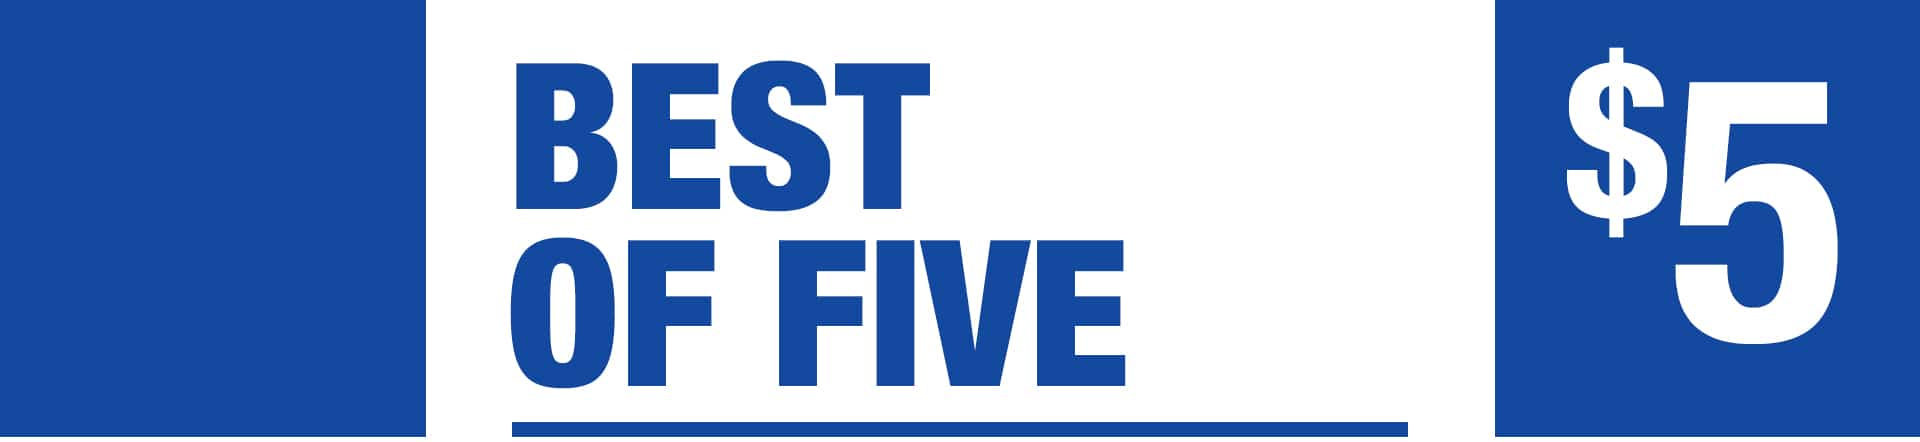 Best Of Five - Five Dollar Jackpot